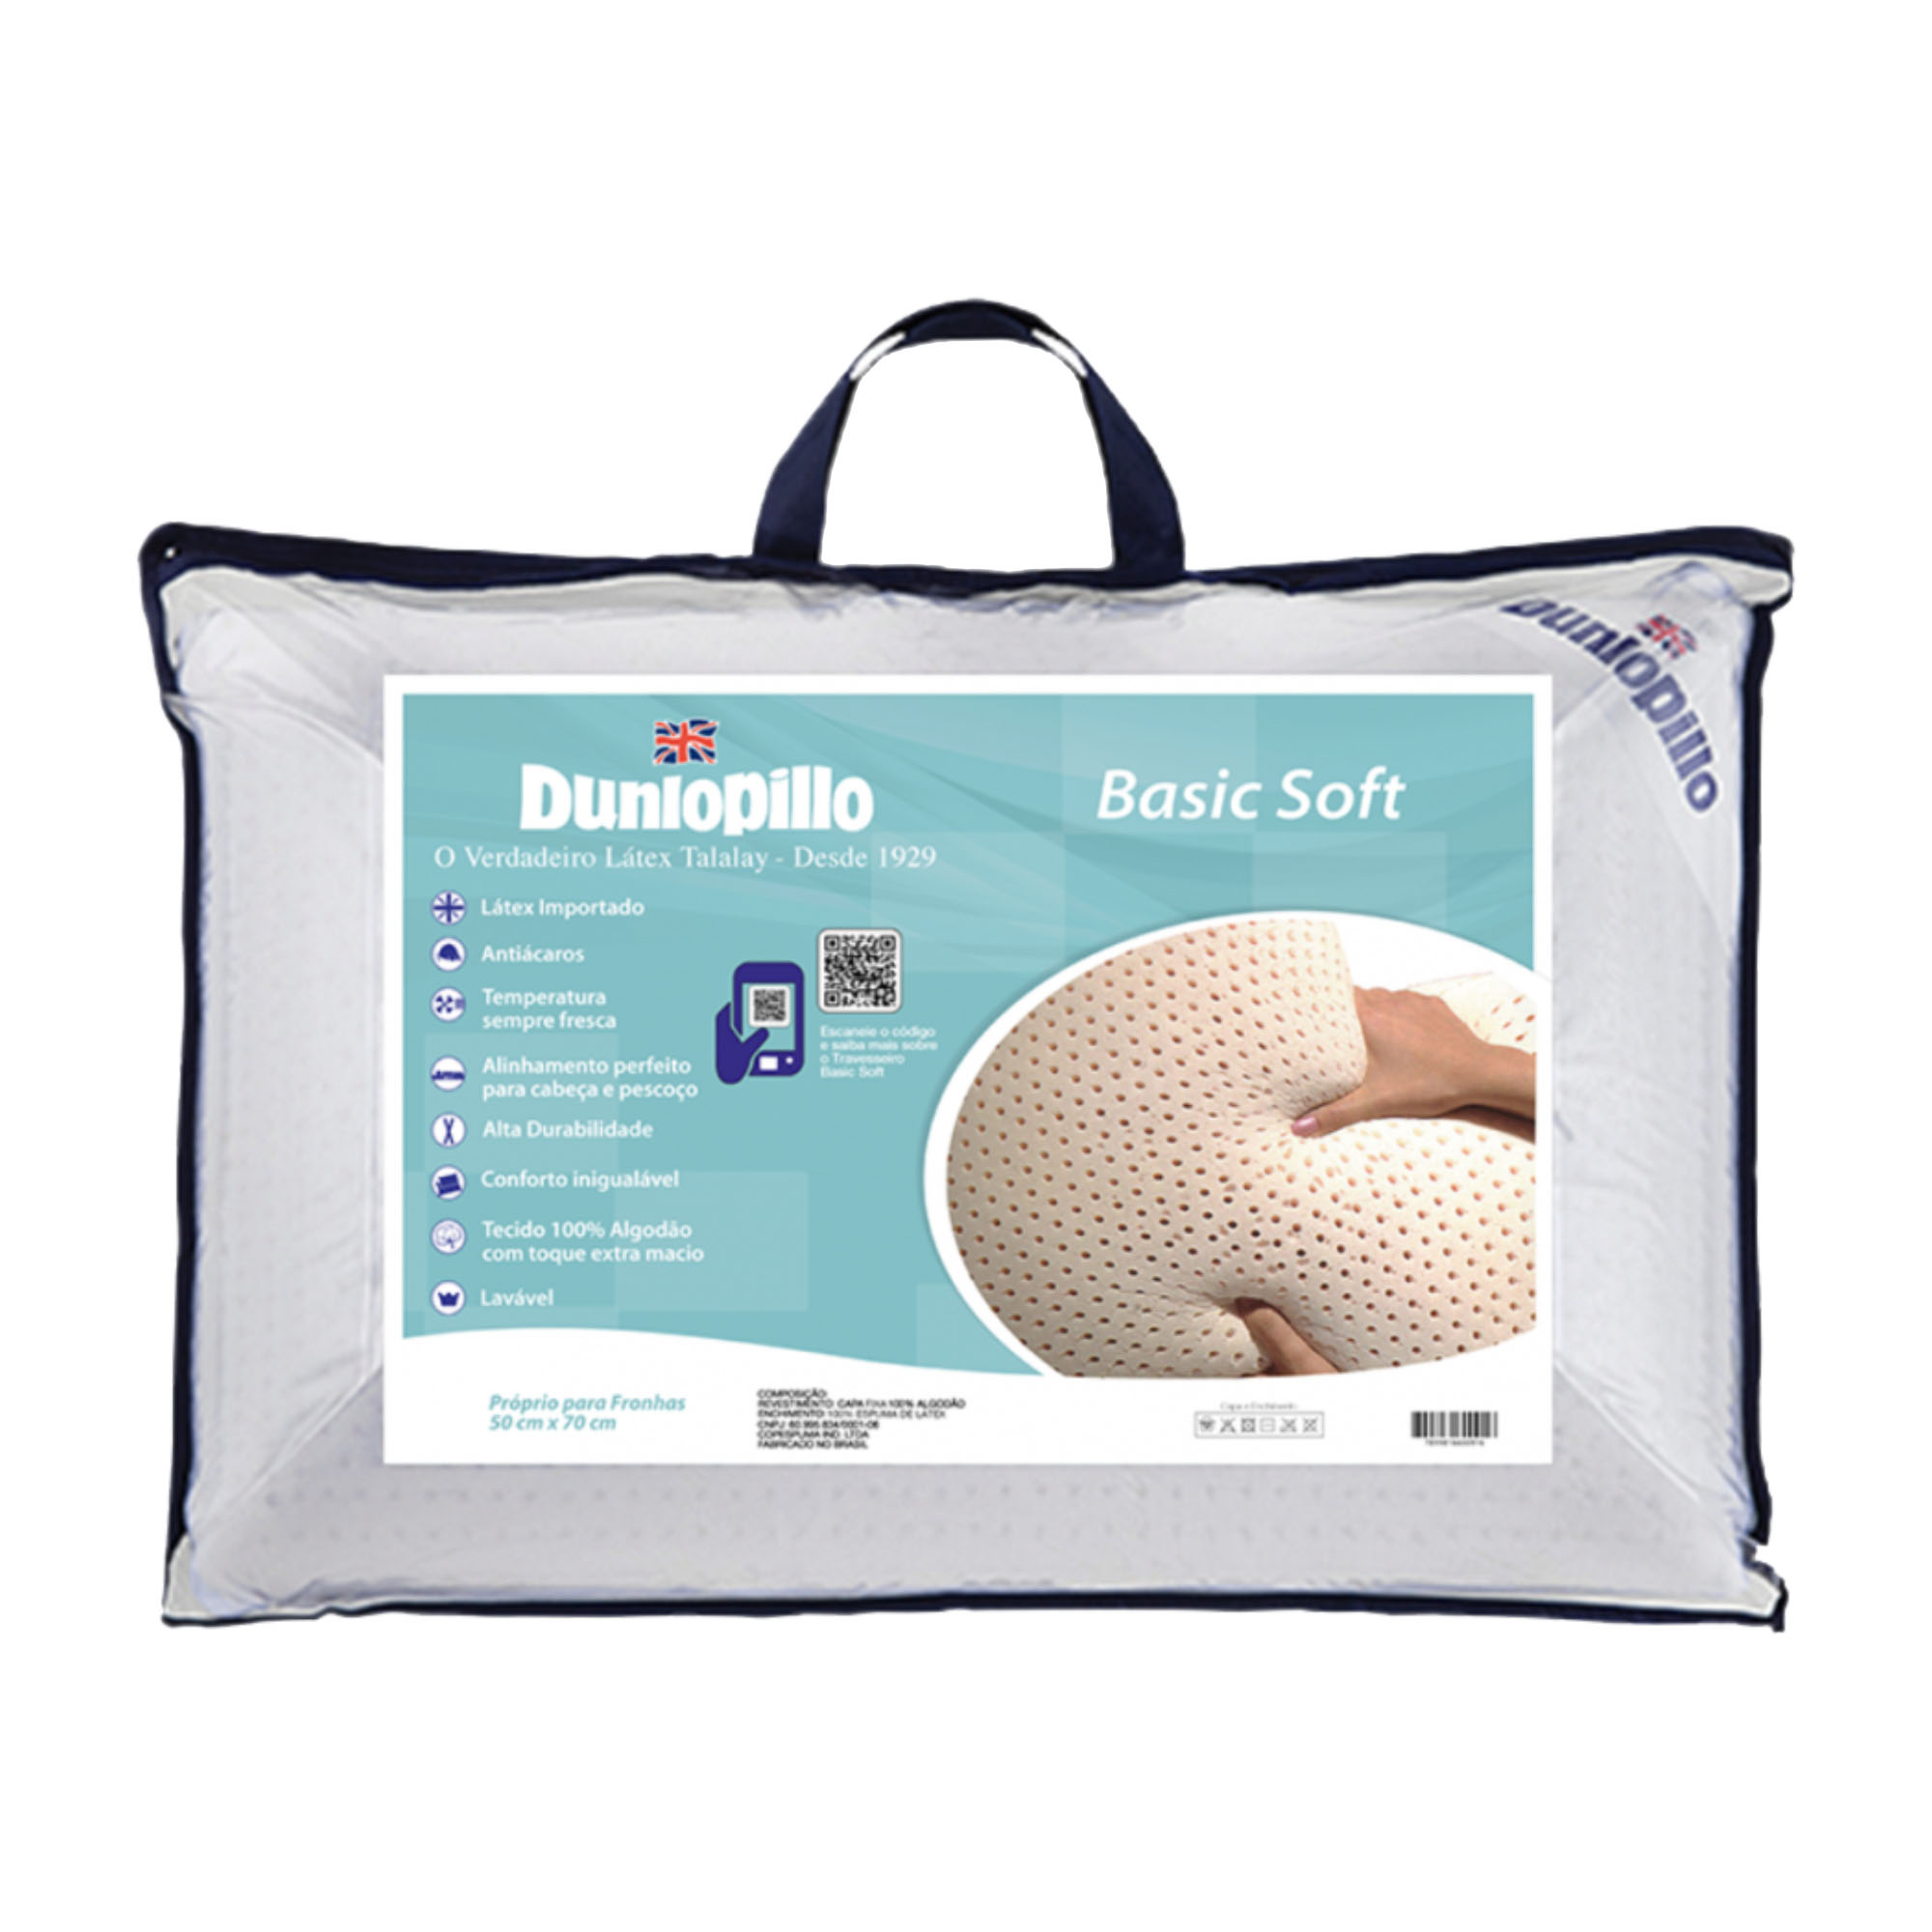 Travesseiro Dunlopillo Basic Soft, 100% Látex, Macio, 050 x 070 cm